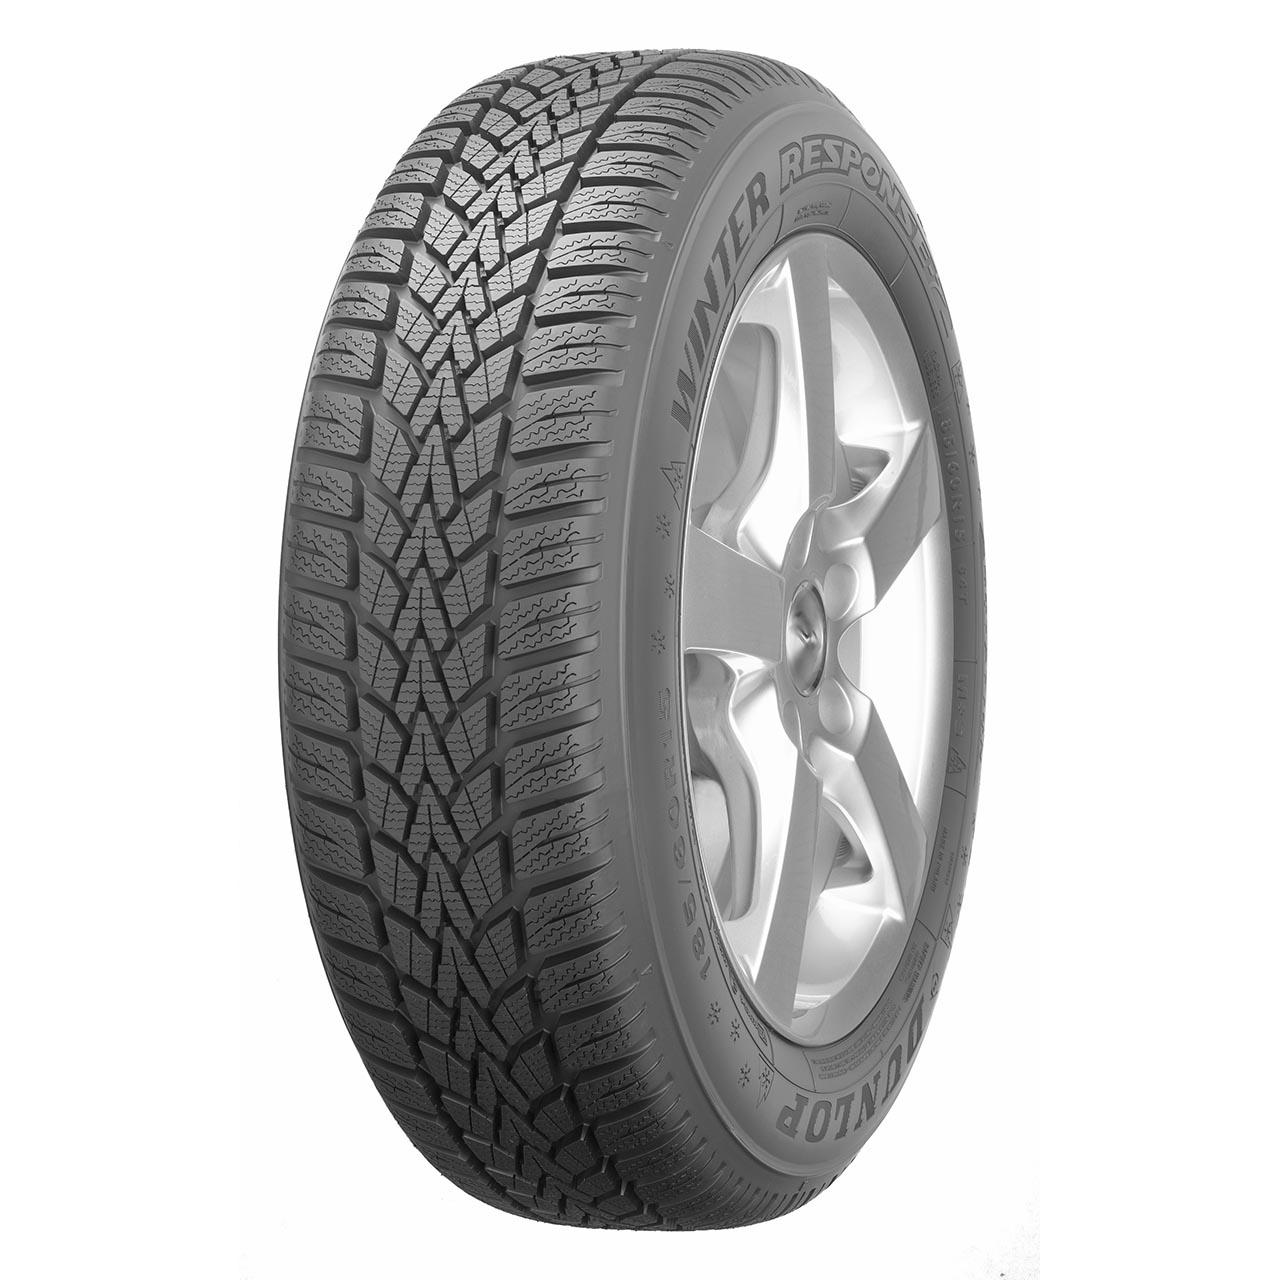 Dunlop SP Winter Response 2 195/65R15 91T MS